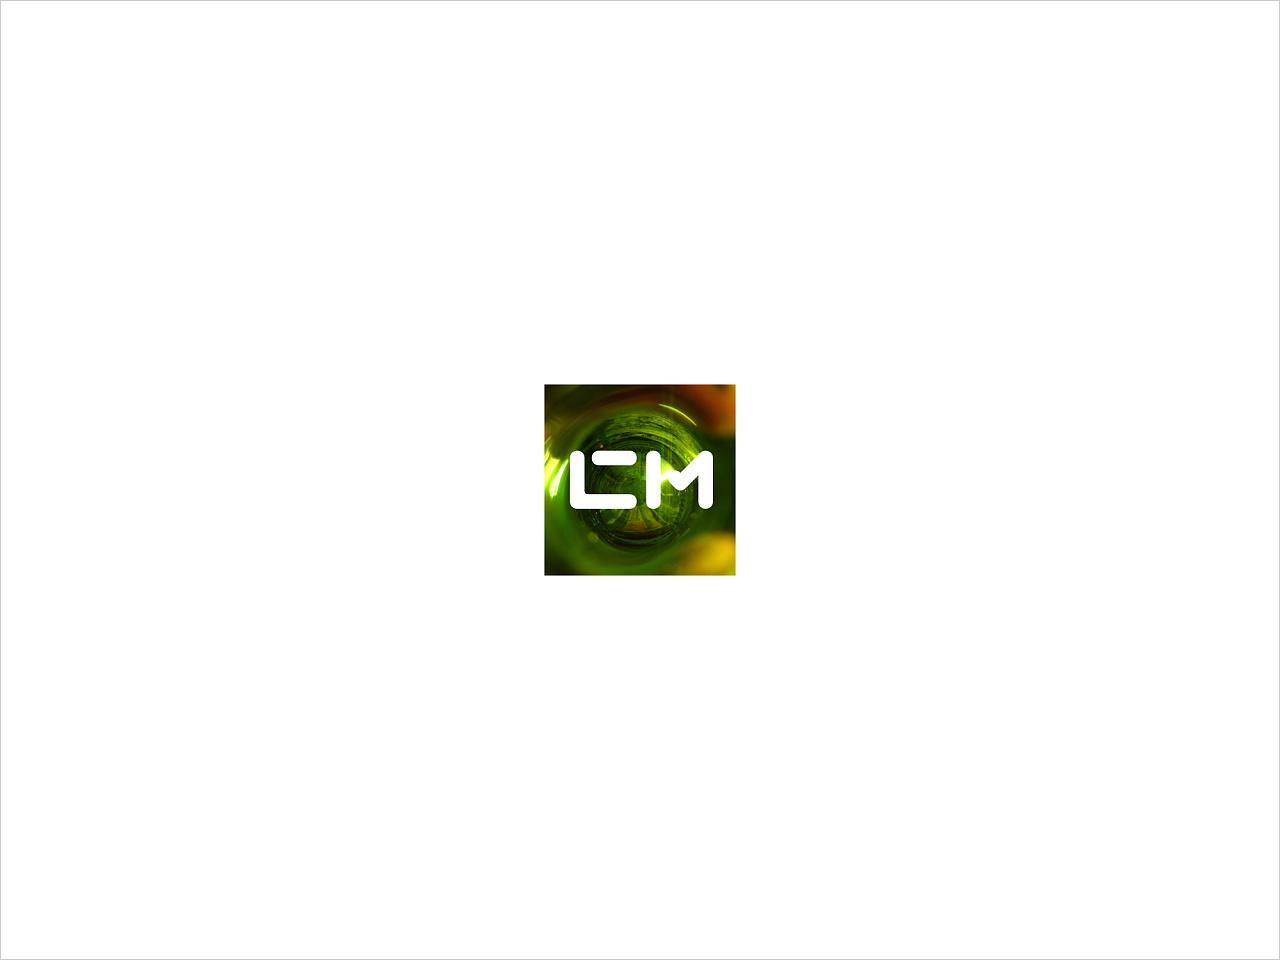 cm 香港潮流品牌形象设计方案-壹行设计yesimvdesign图片